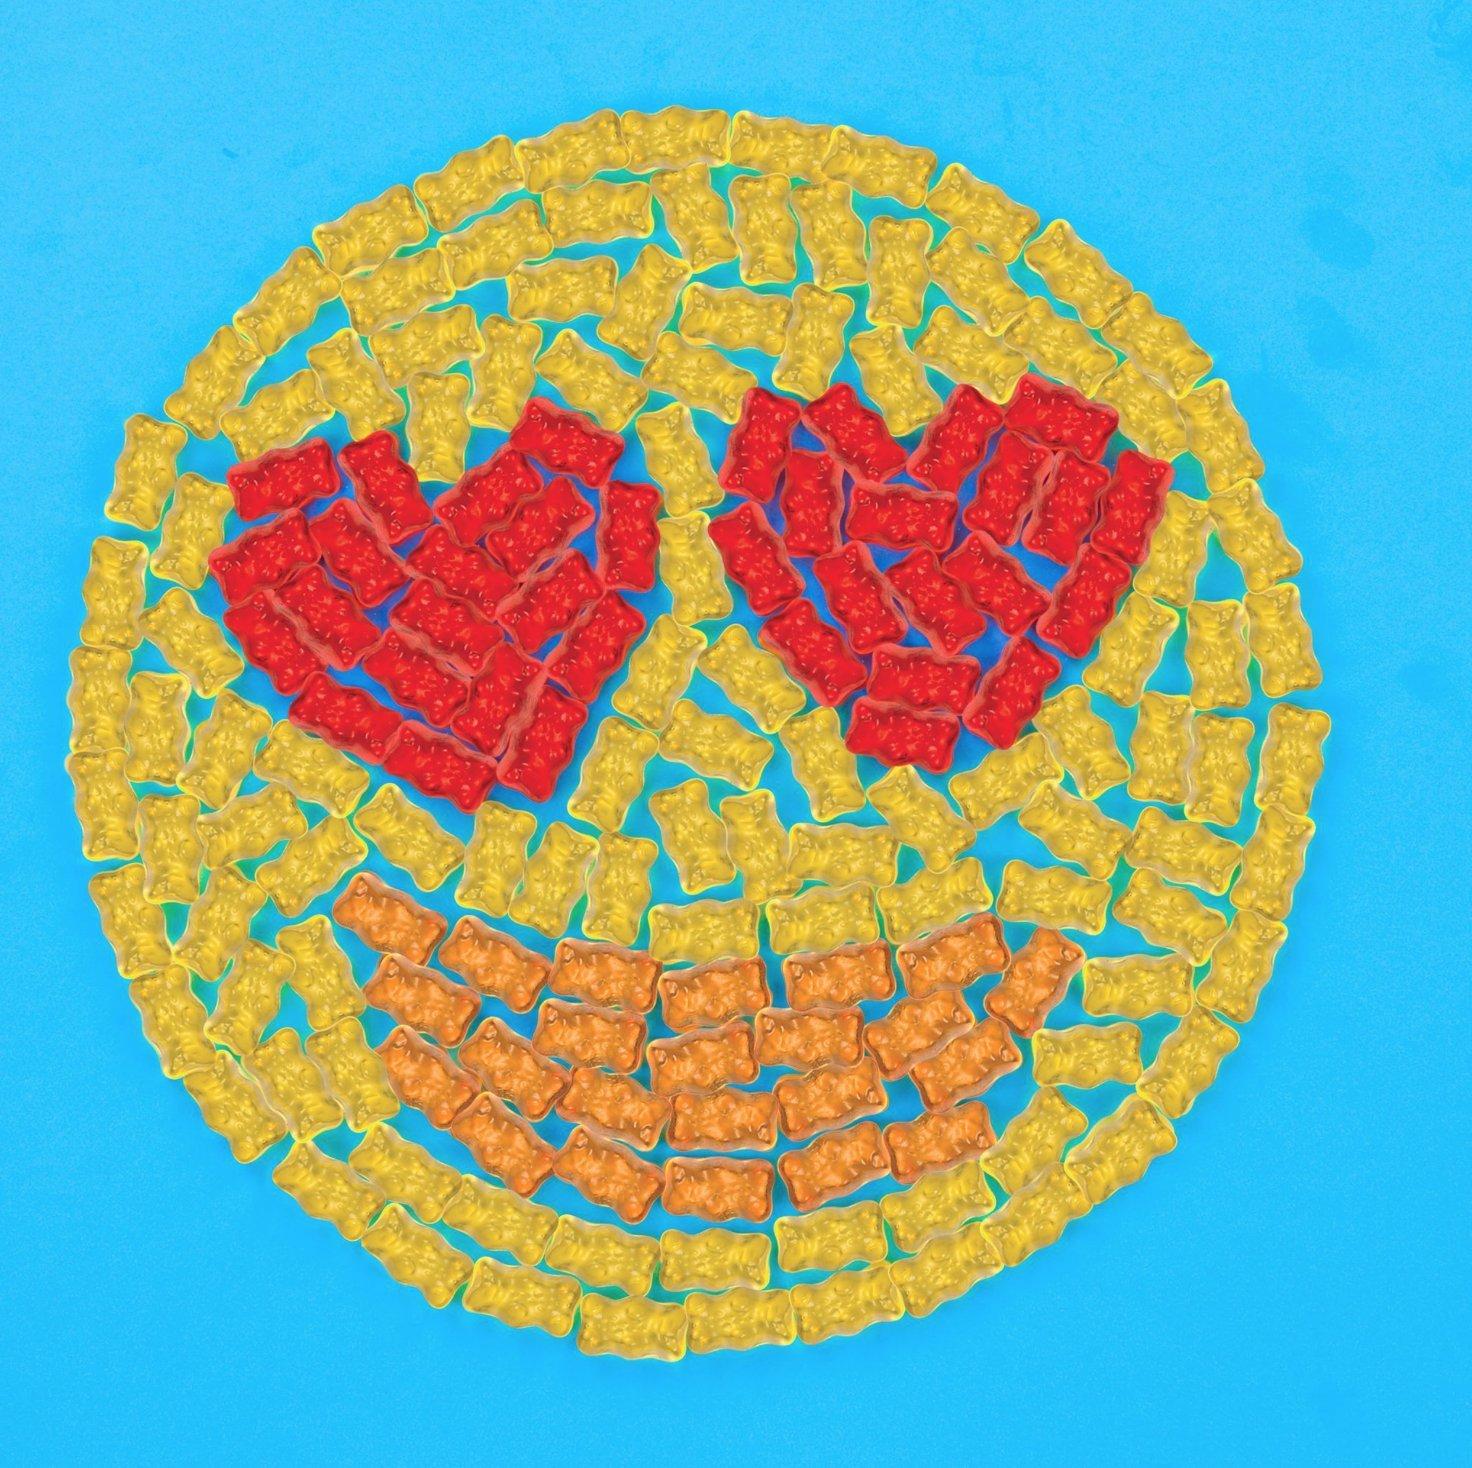 Haribo Gummi Candy, Goldbears Gummy Candy, 48 Ounce Bag (Pack of 4) by Haribo (Image #6)